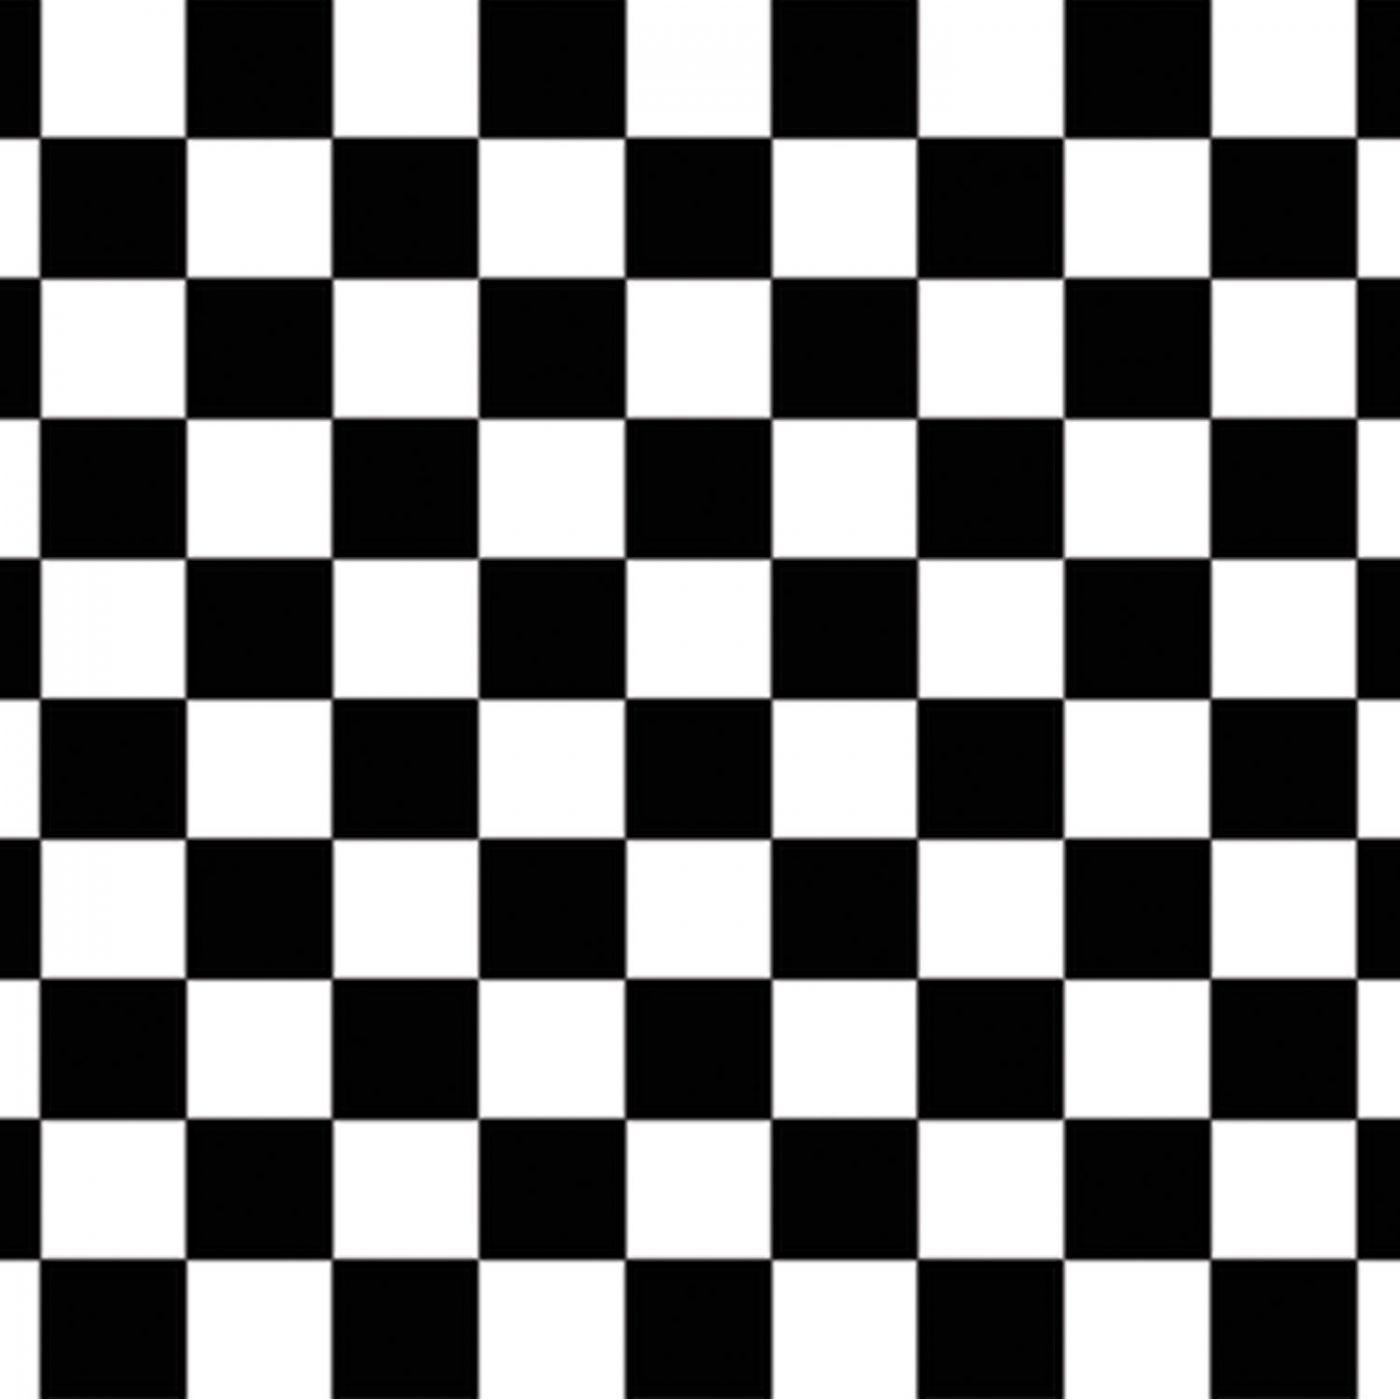 Checkered Backdrop (6) image